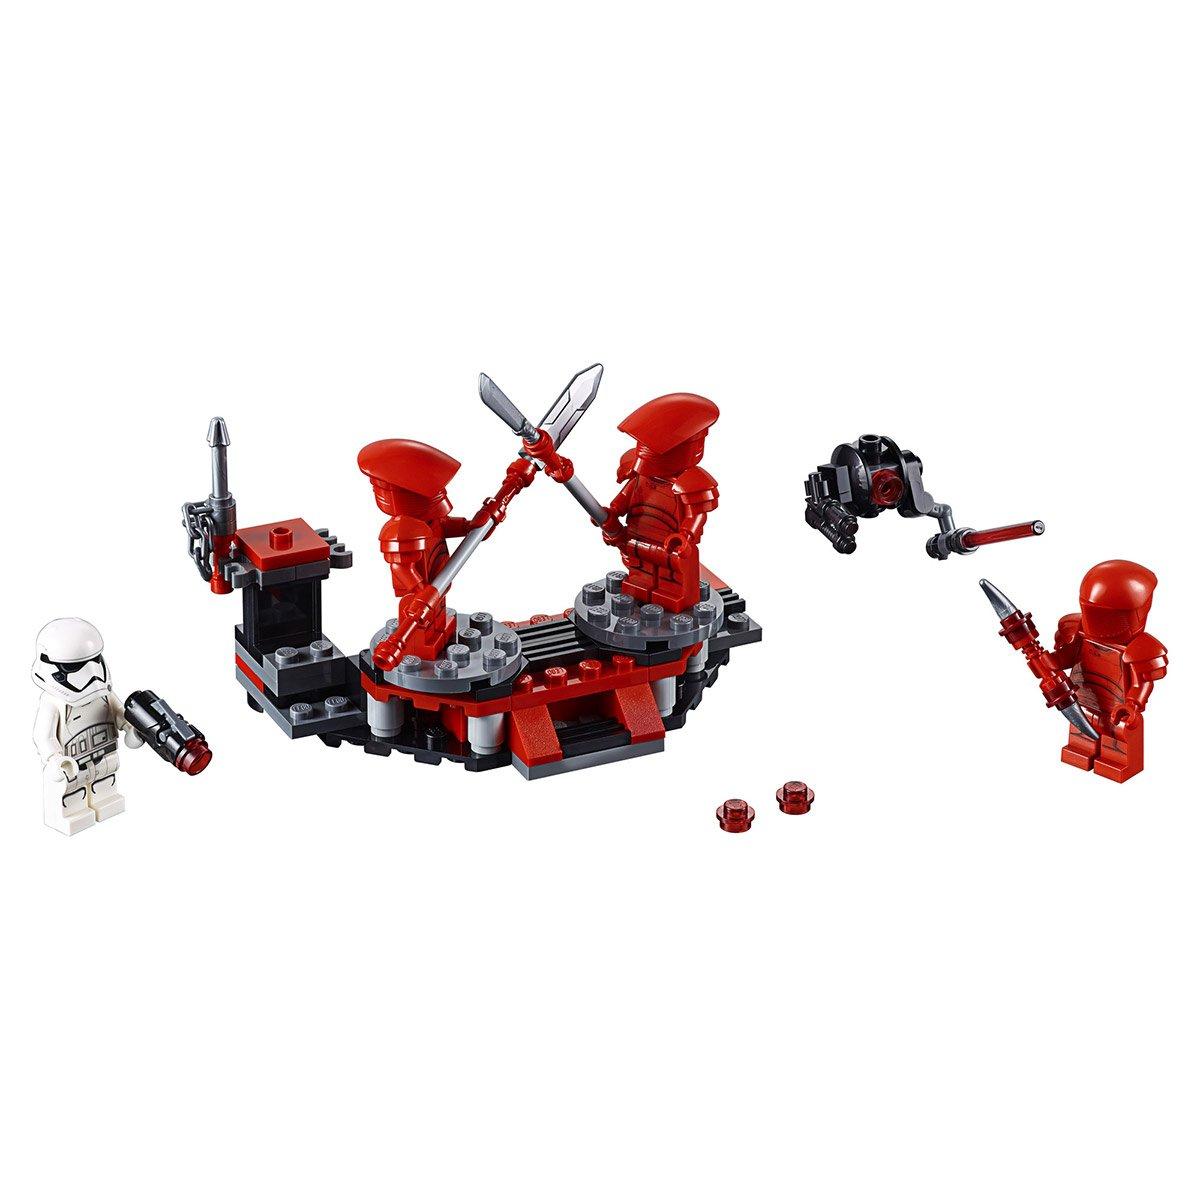 Lego Star Wars-Elite prétorienne formation Droid du set 75225